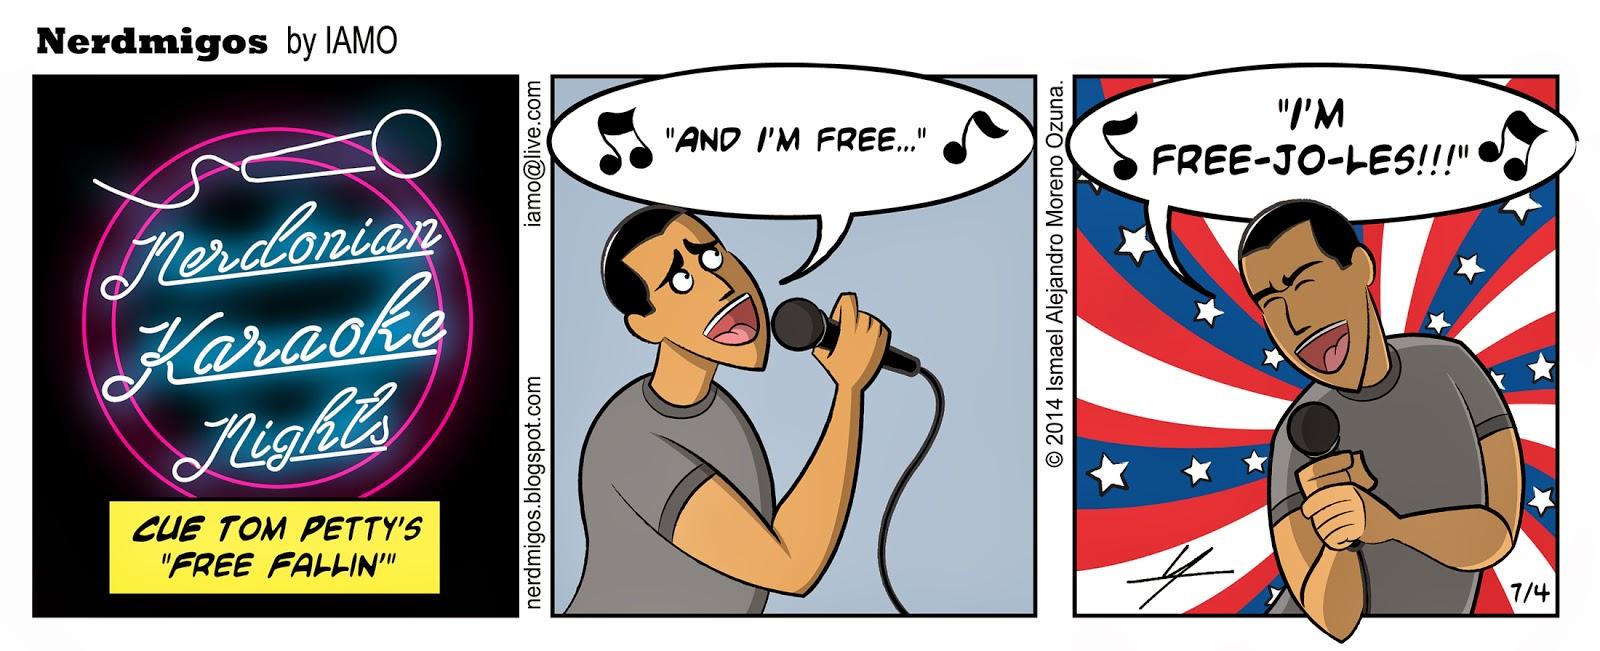 Nerdmigos Free Fallin Tom Petty Karaoke by IAMO